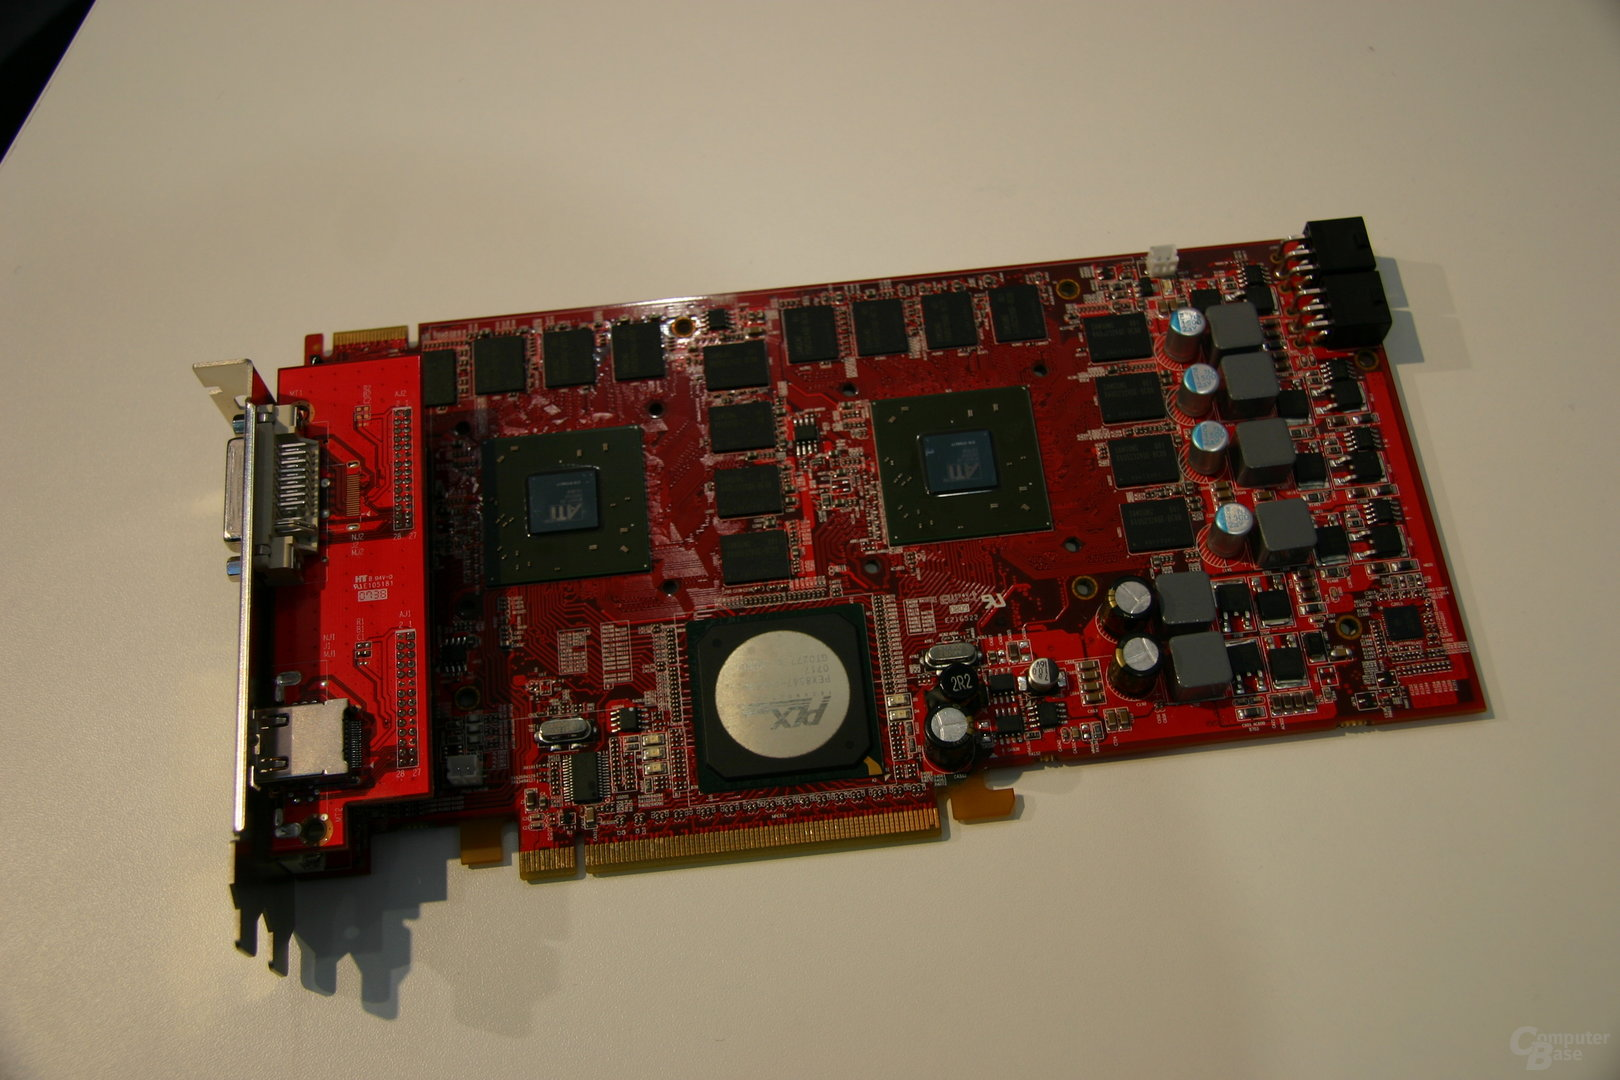 PowerColor Radeon HD 3870 X2 GDDR4